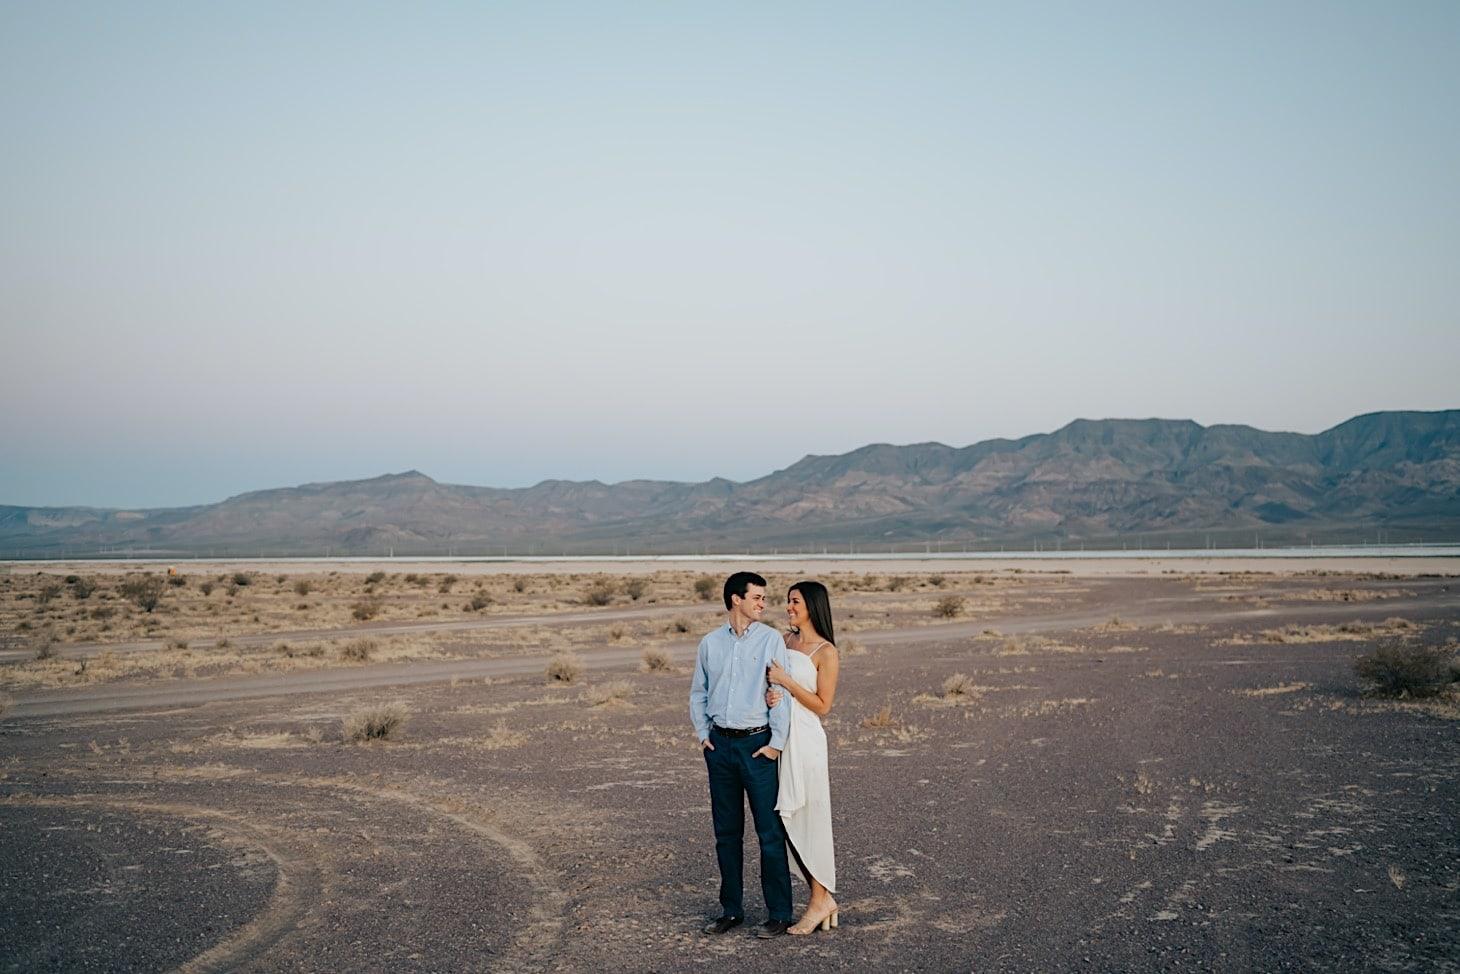 nevada desert engagement photos